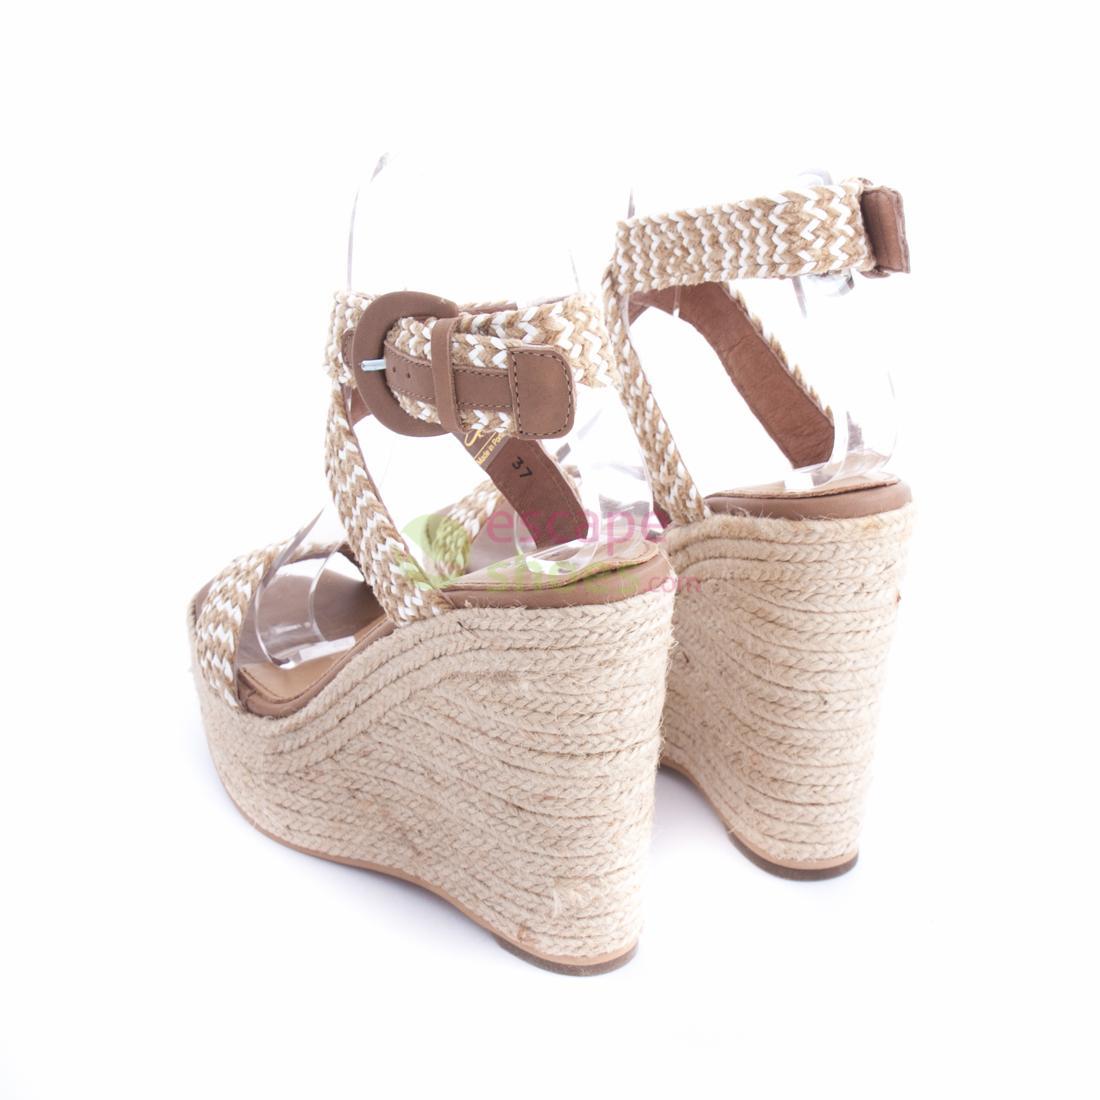 Sandals CUBANAS Lura160 Almond